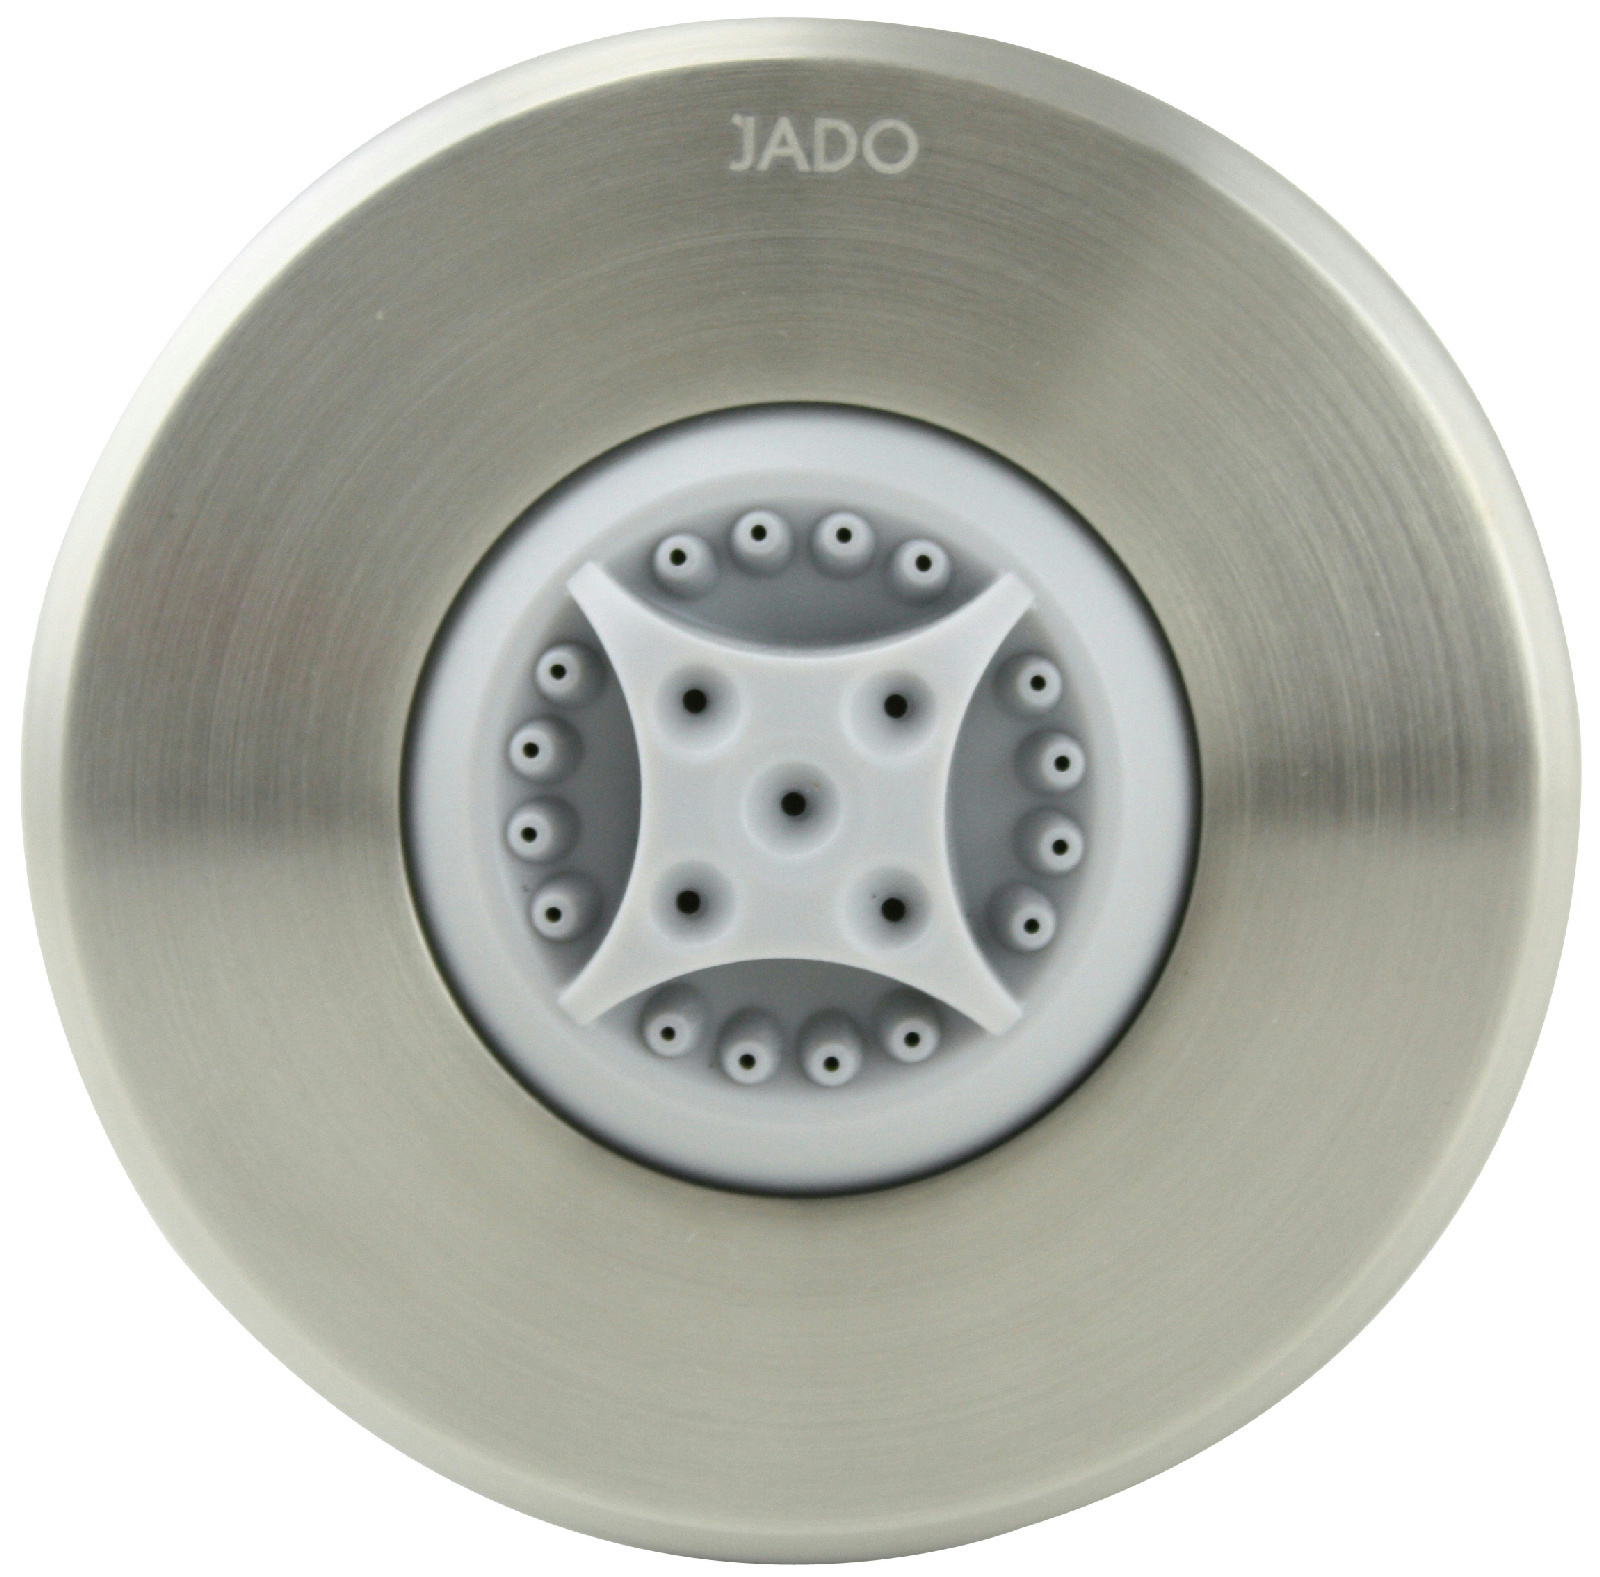 Jado 3-Inch Diamond Ceiling Mount Shower Arm 860903.167